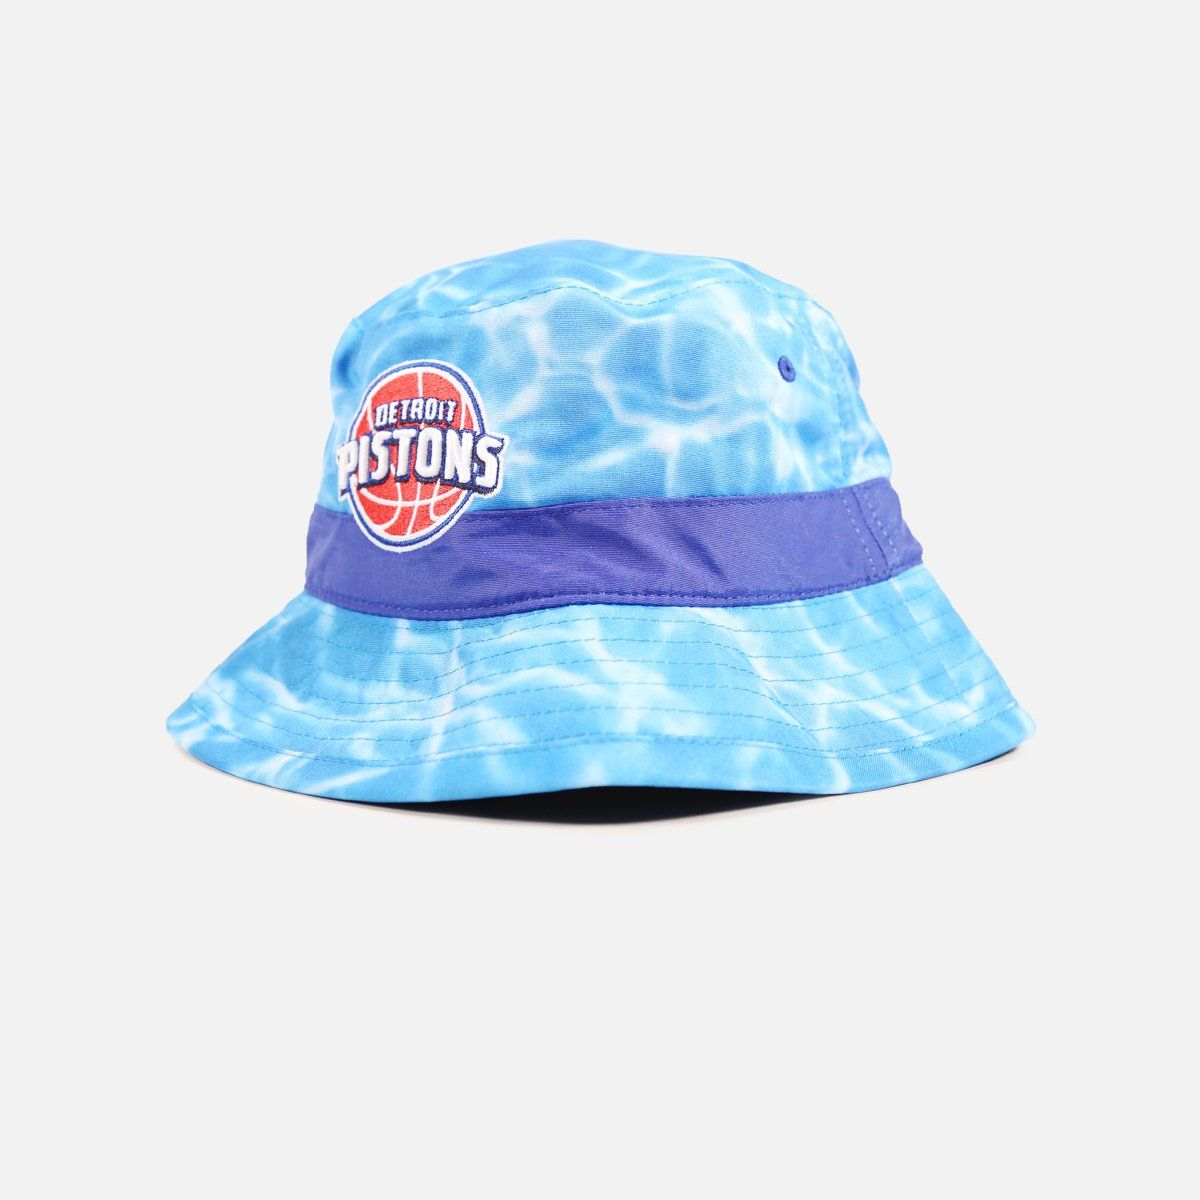 a7bc286e3b1 Mitchell   Ness Detroit Pistons Surf Camo Bucket Hat